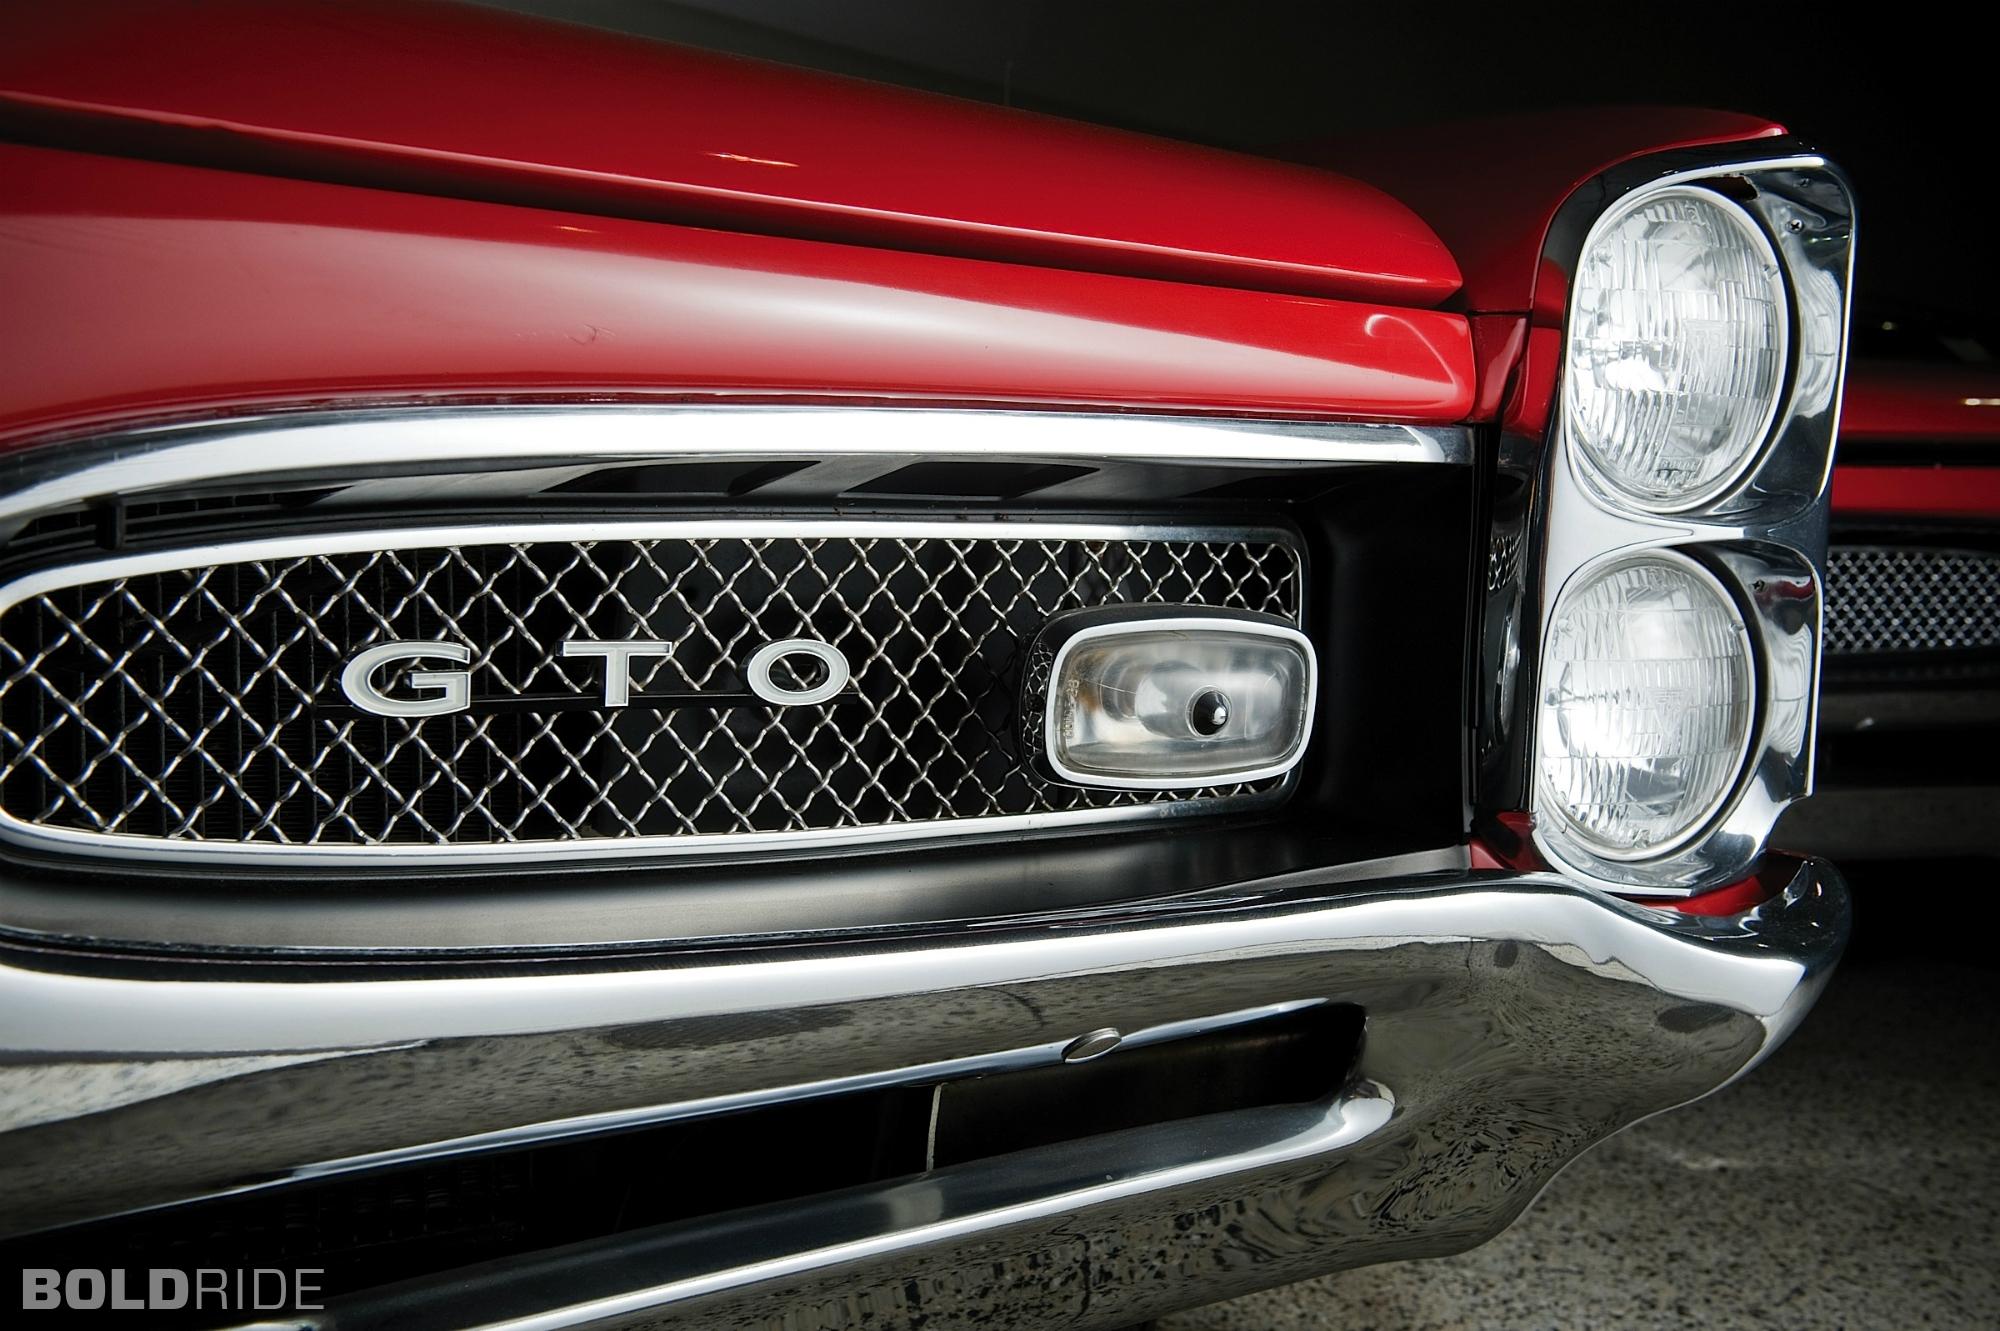 1967 pontiac gto 1024 x 770 1967 pontiac gto 1280 x 1080 1967 pontiac 2000x1331